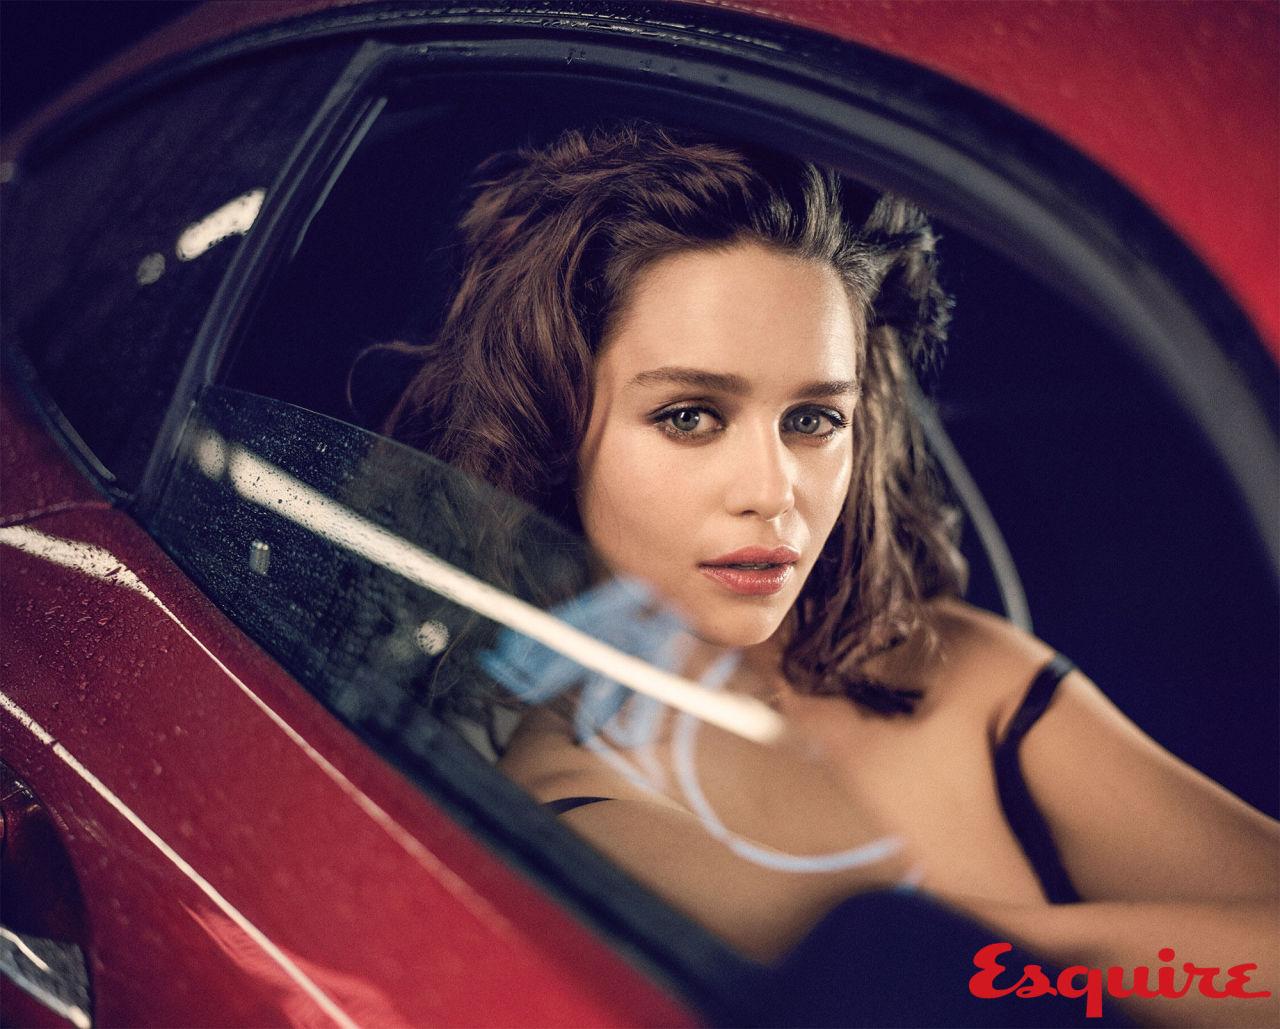 gallery-1444418953-emilia-clarke-sexiest-woman-alive-2015-006